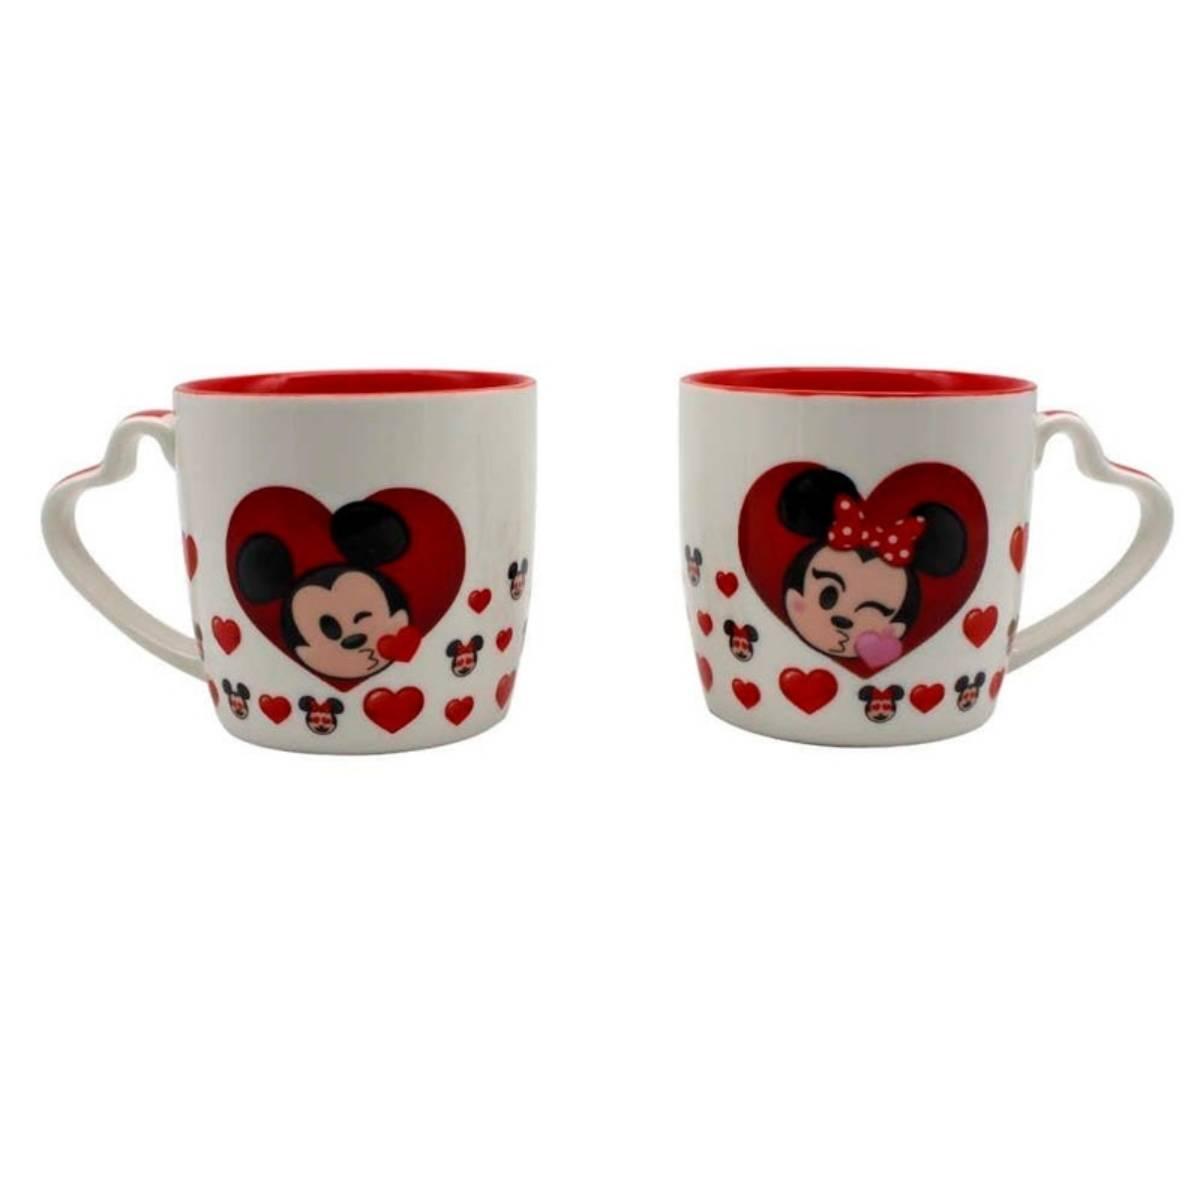 Kit 2 Canecas Mickey e Minnie Emoji Corações Disney